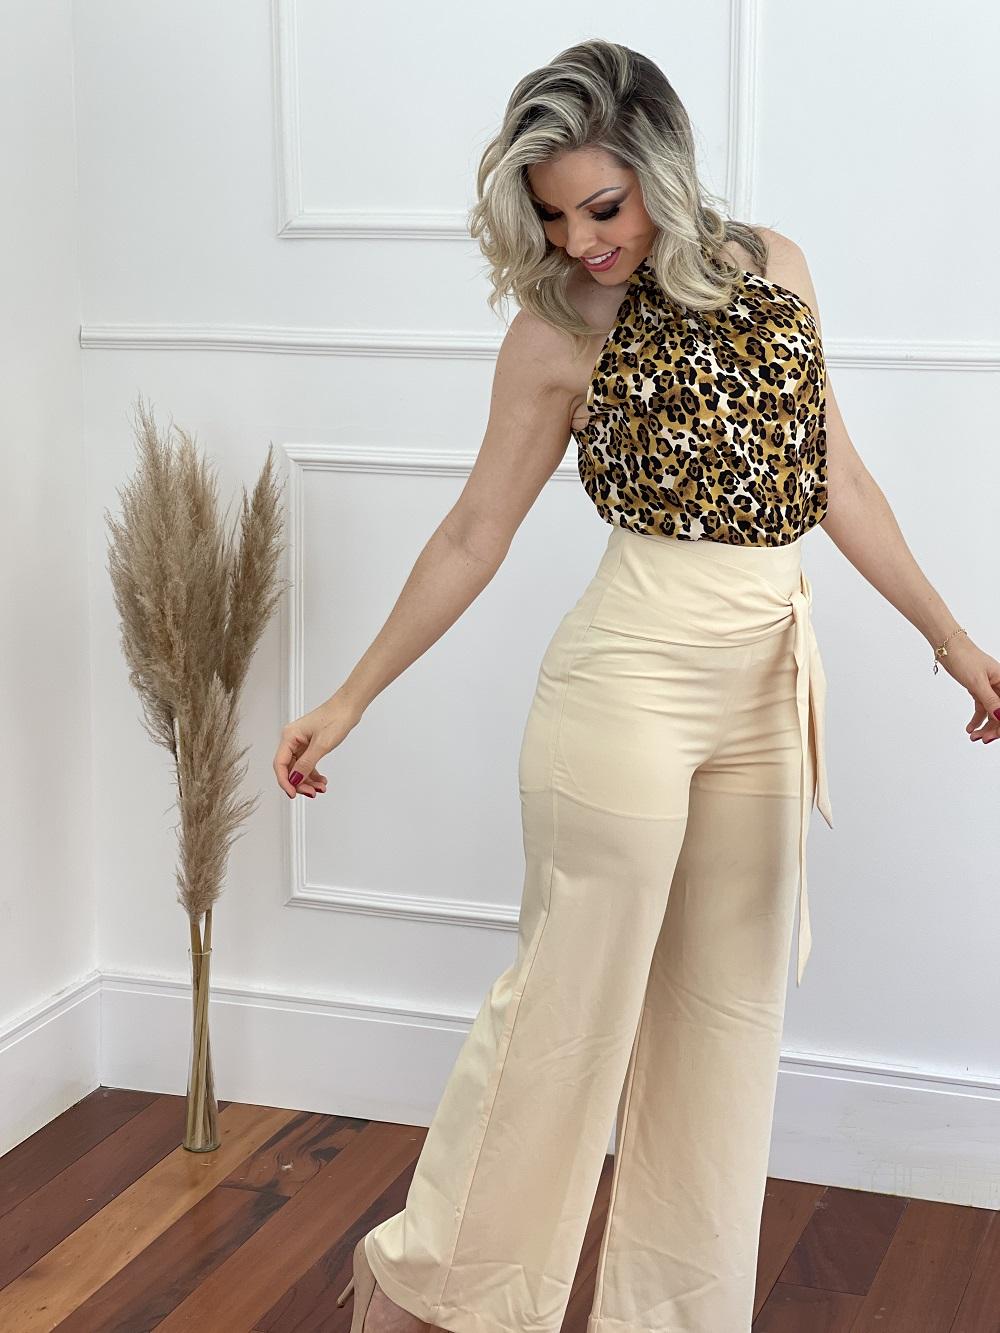 Conjunto: Blusa Cava Americana Gola Alta Estampada Animal Print + Calça Pantalona Detalhe Amarrar Bege